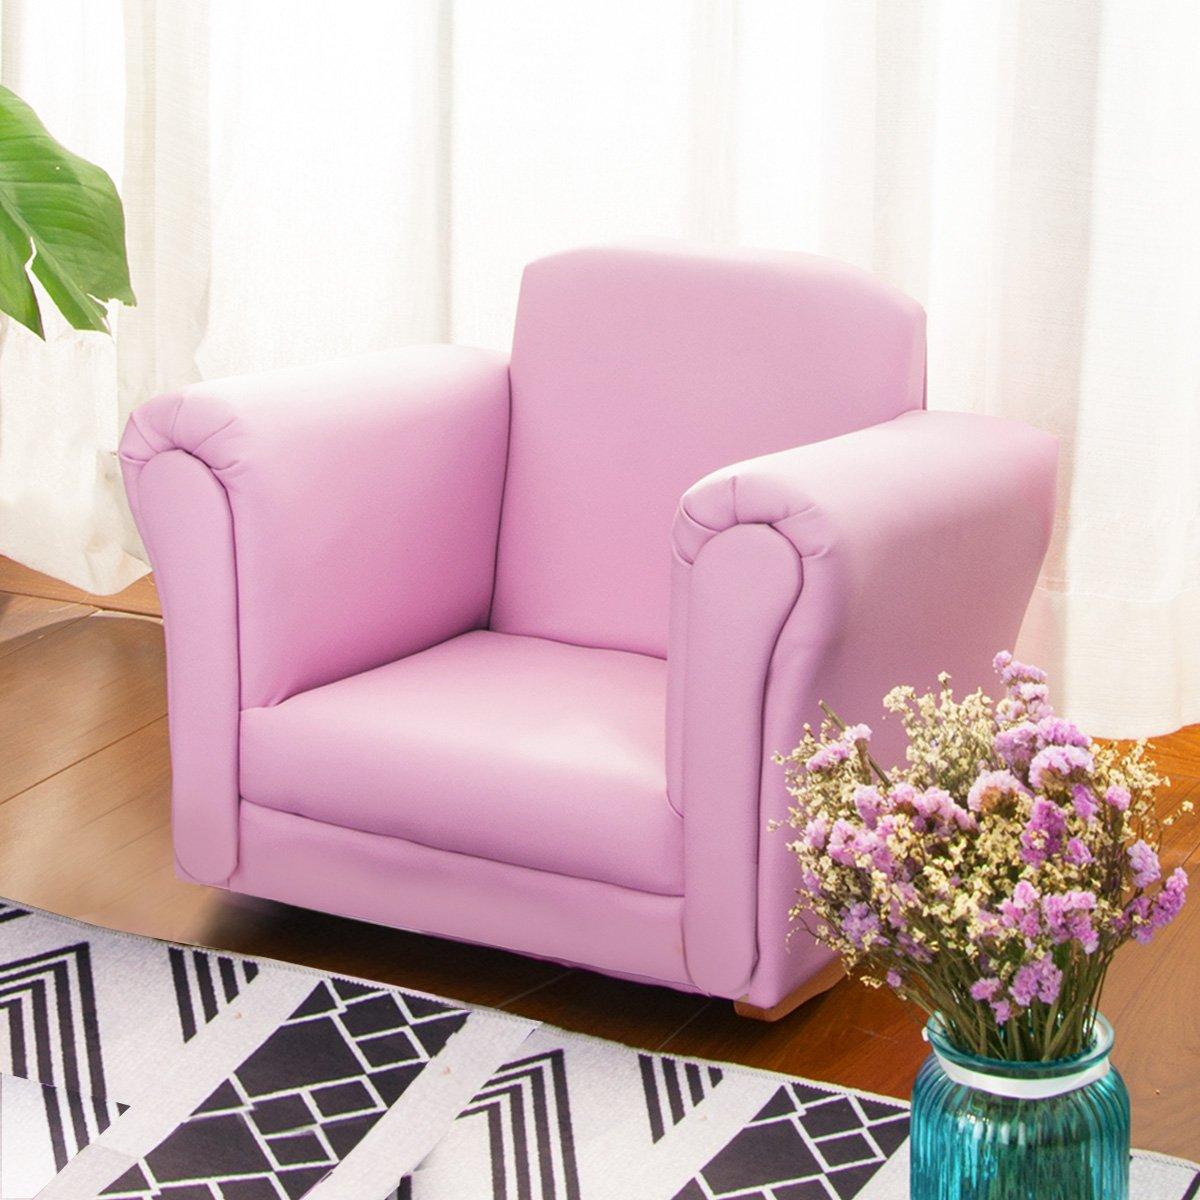 Harper&Bright Designs PP038177 Kids Sofa Rocking Children Armrest Chair with PU Leather Pink